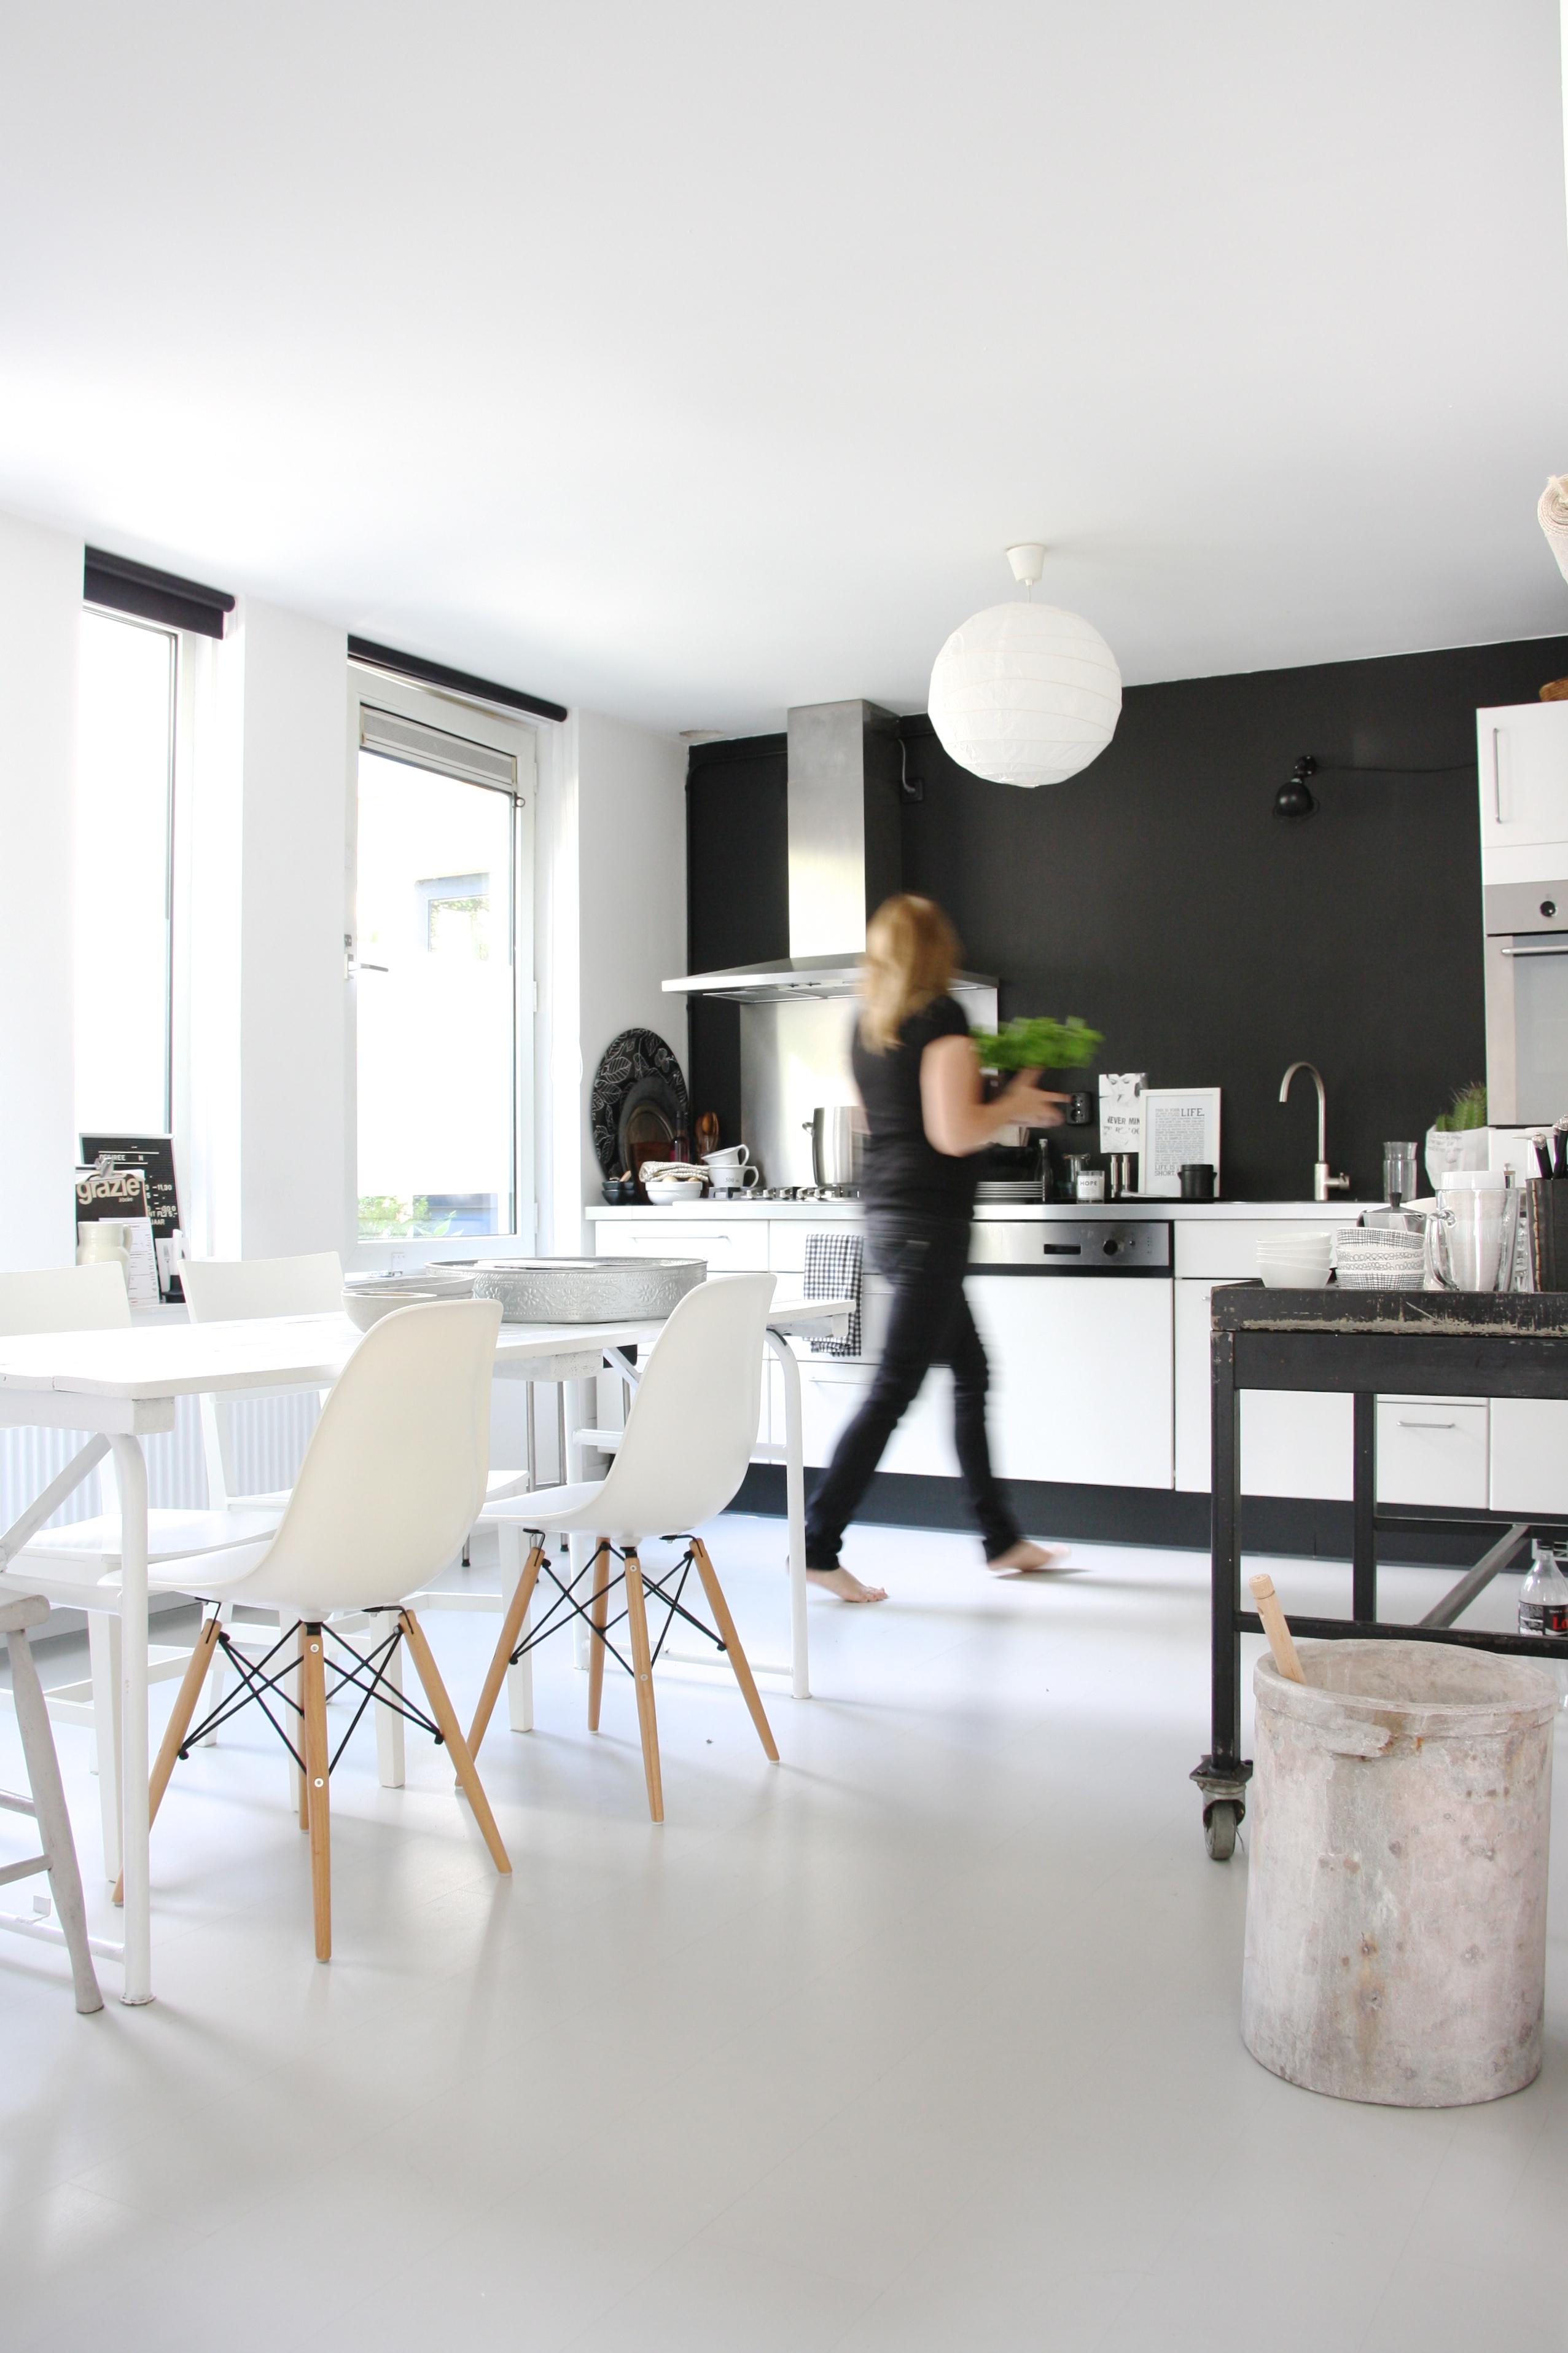 Monochrome Amsterdam Abode - Avenue Lifestyle Avenue Lifestyle